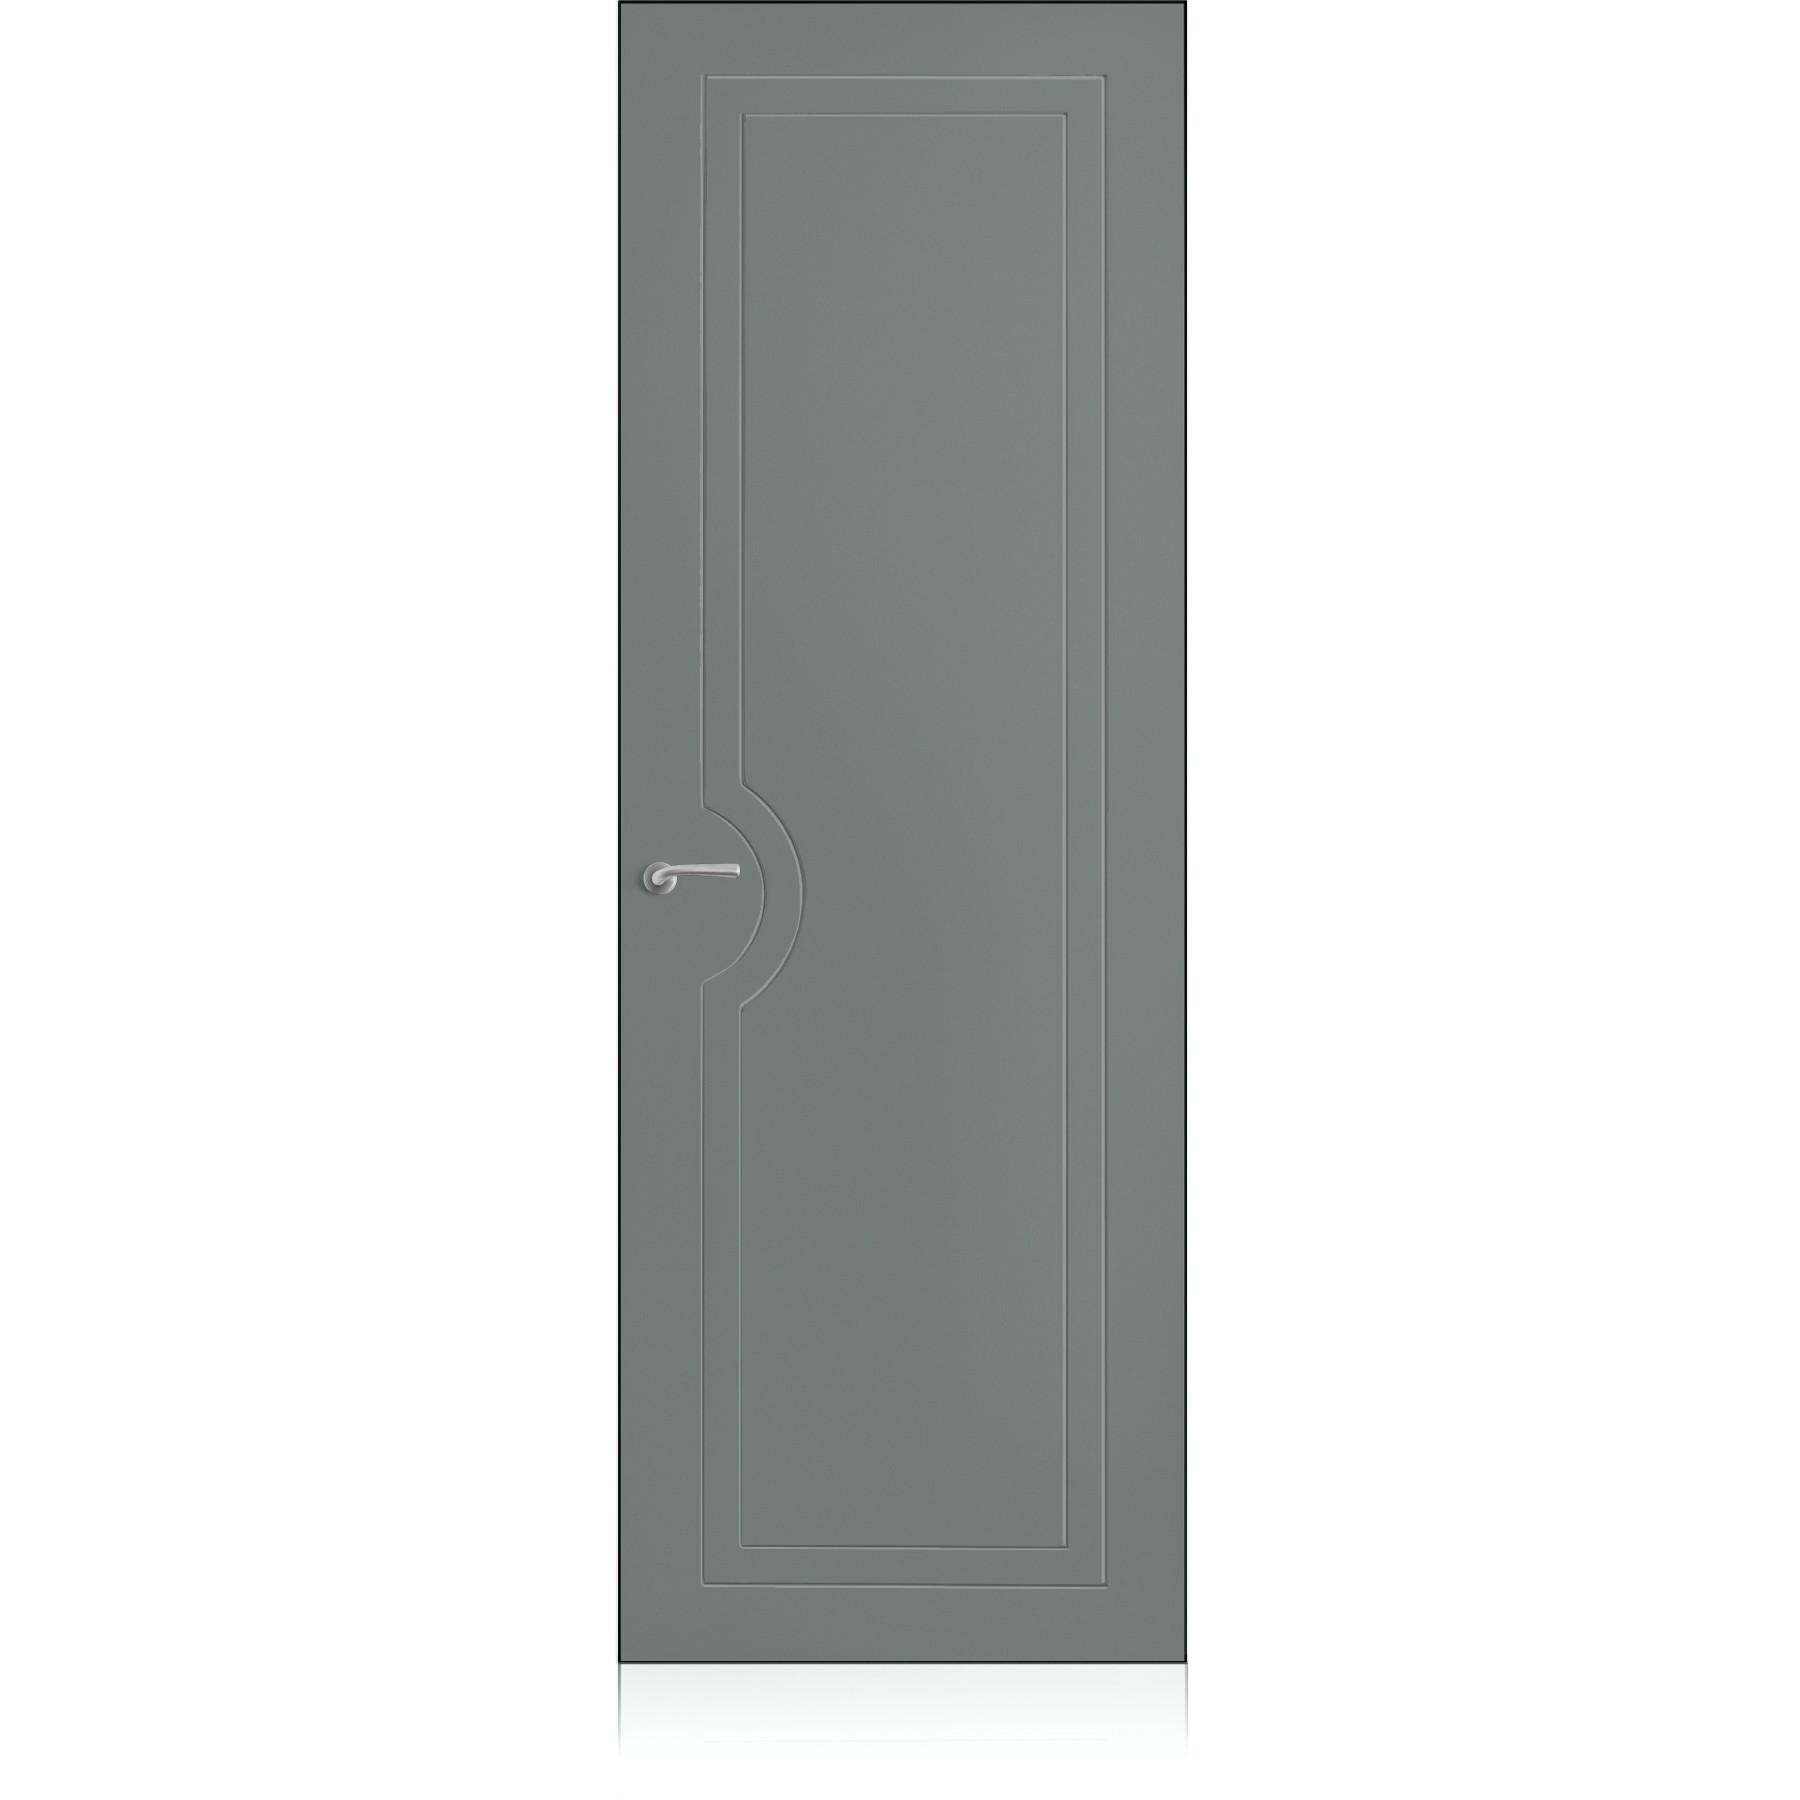 Yncisa/1 Zero Metallo Light Laccato ULTRAopaco door